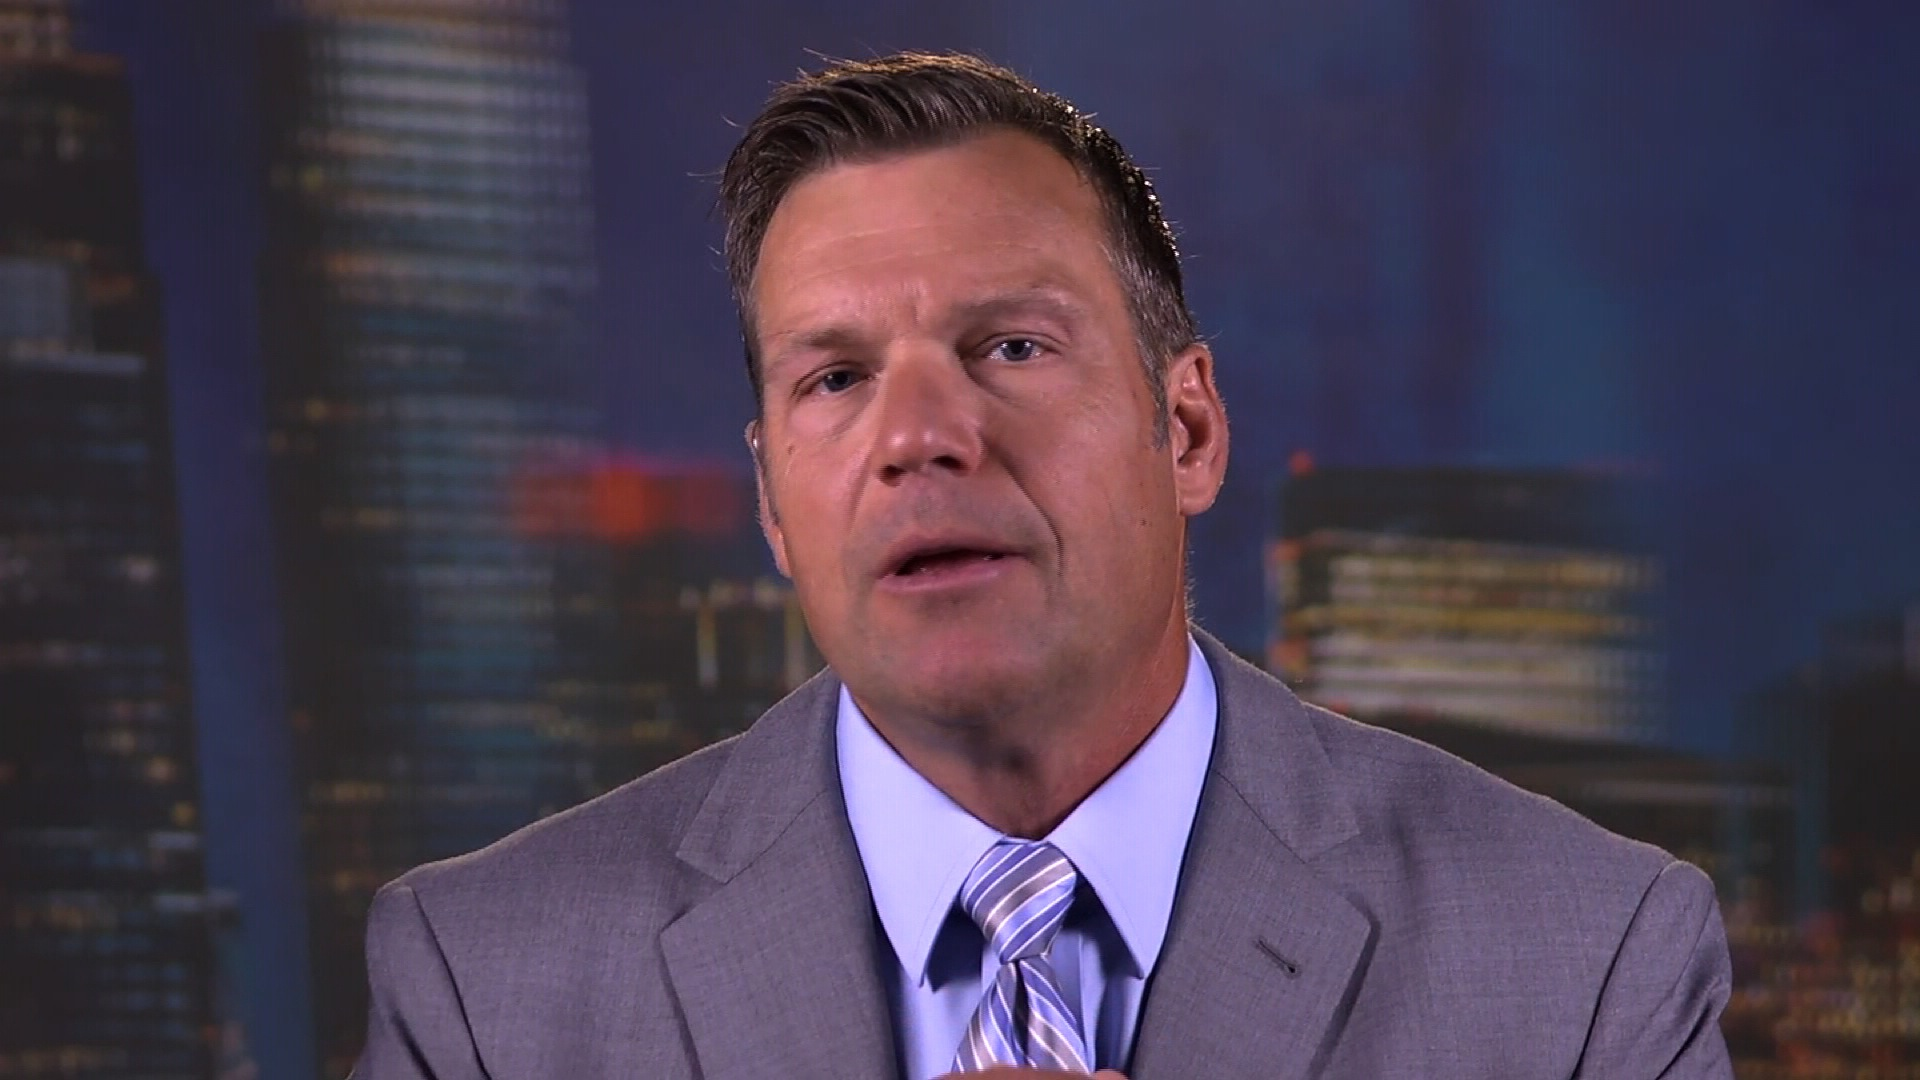 New GOP-aligned group in Kansas has Kris Kobach as apparent target